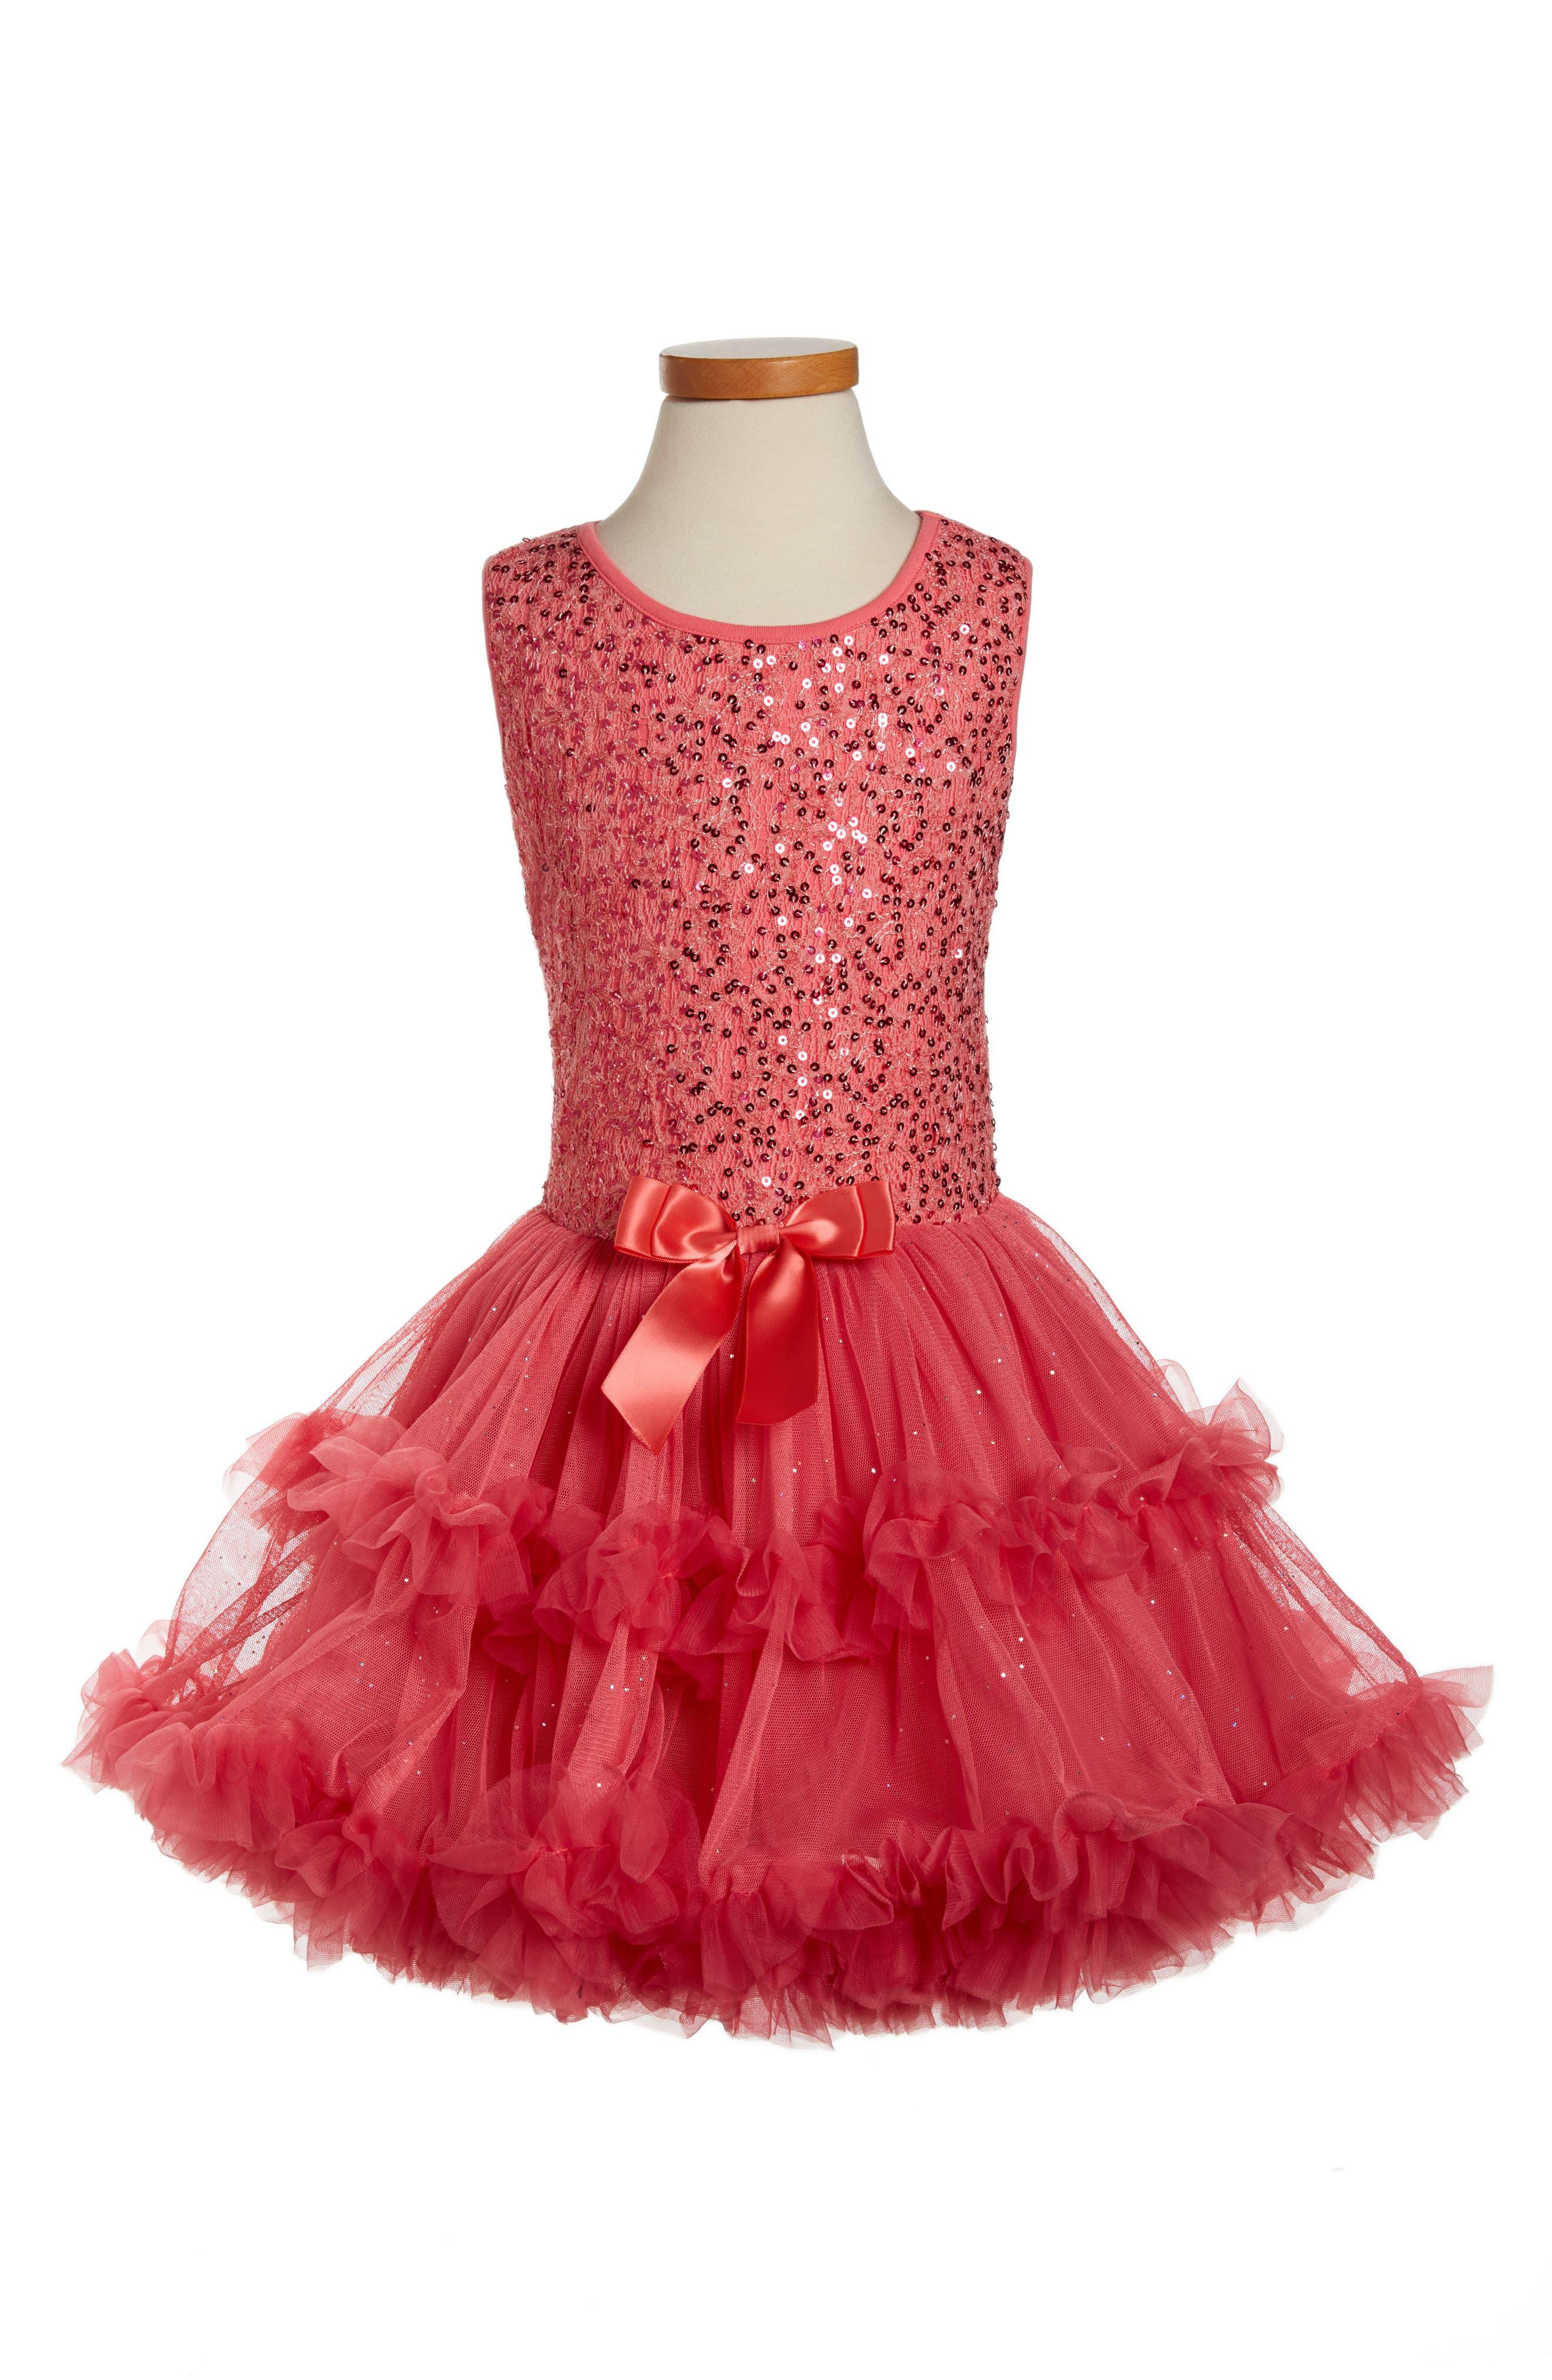 Main Image - Popatu Sequin Sleeveless Dress (Toddler Girls & Little Girls)